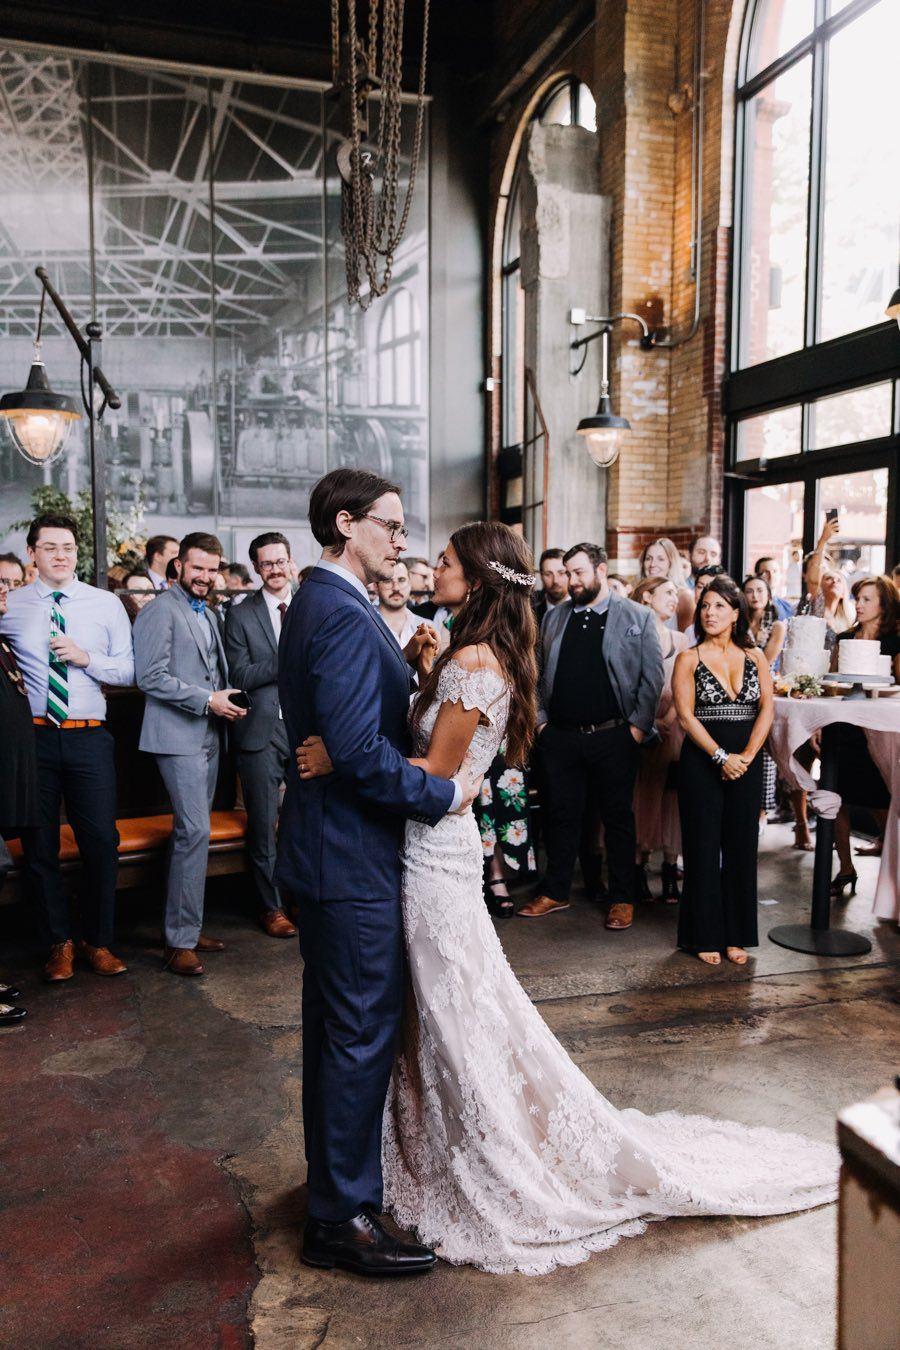 la peg wedding first dance